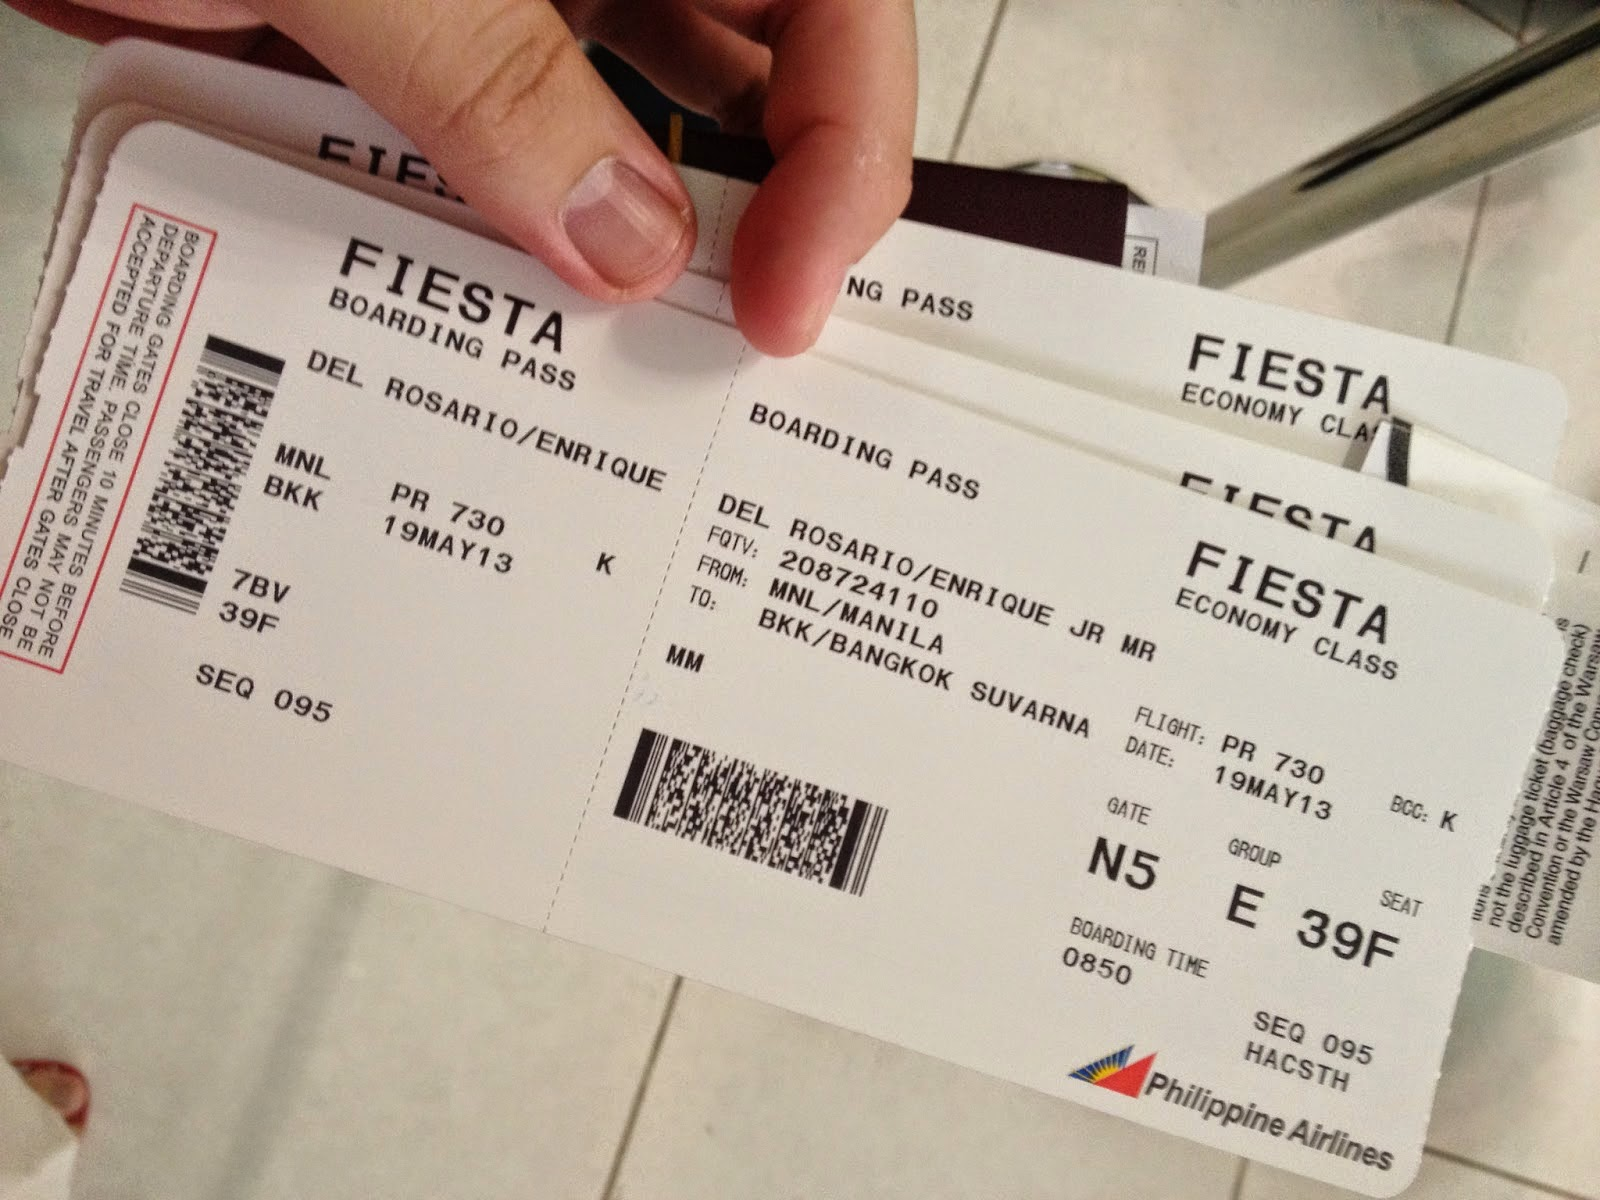 Danica for Flights ny to paris